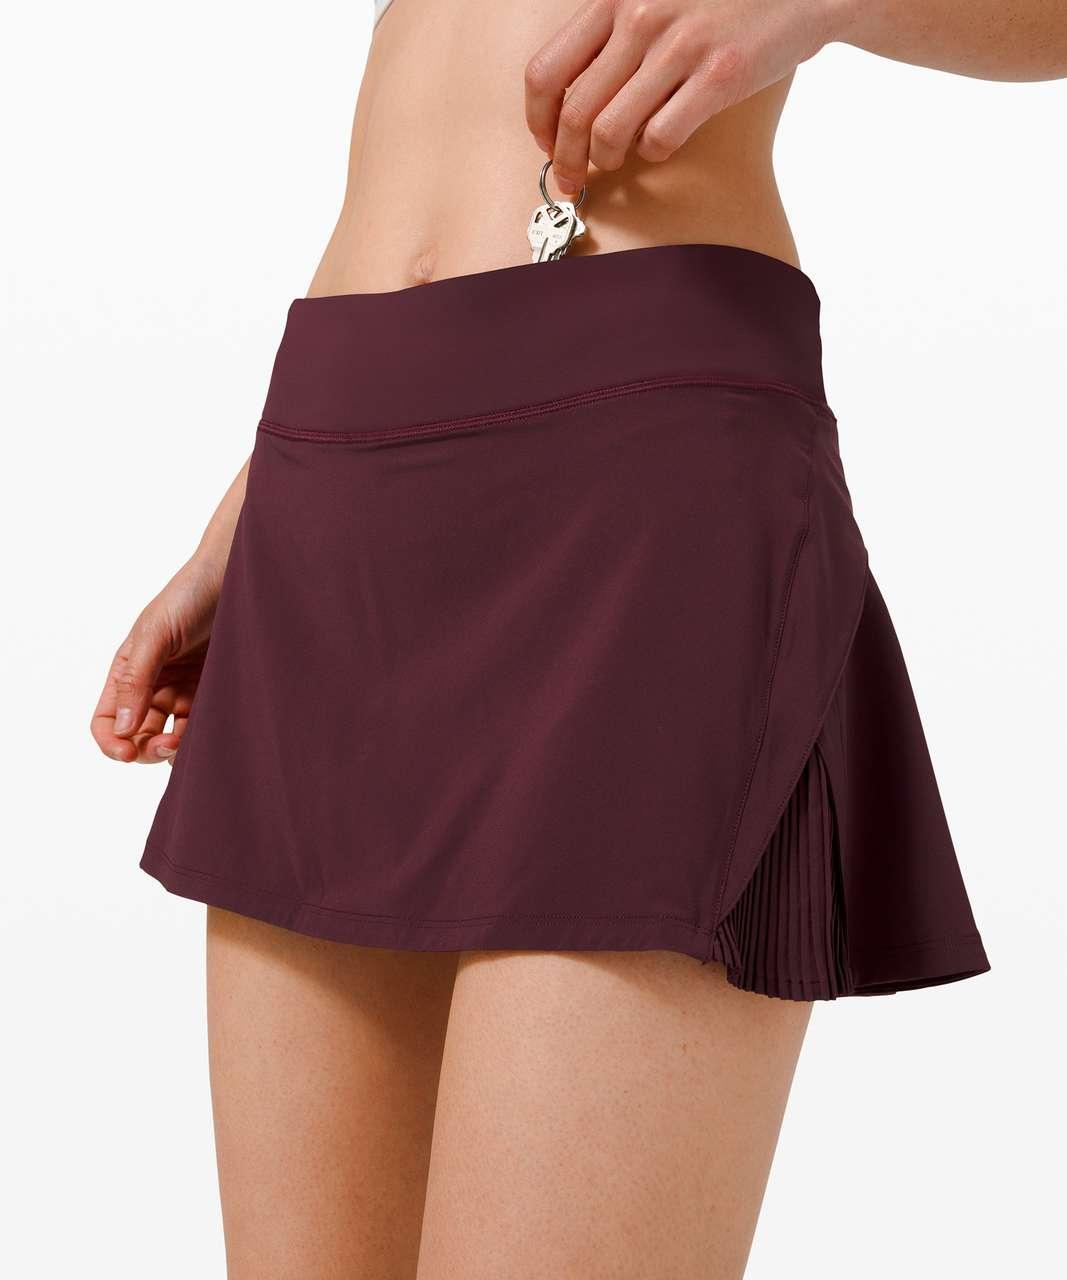 "Lululemon Play Off The Pleats Skirt *13"" - Cassis"